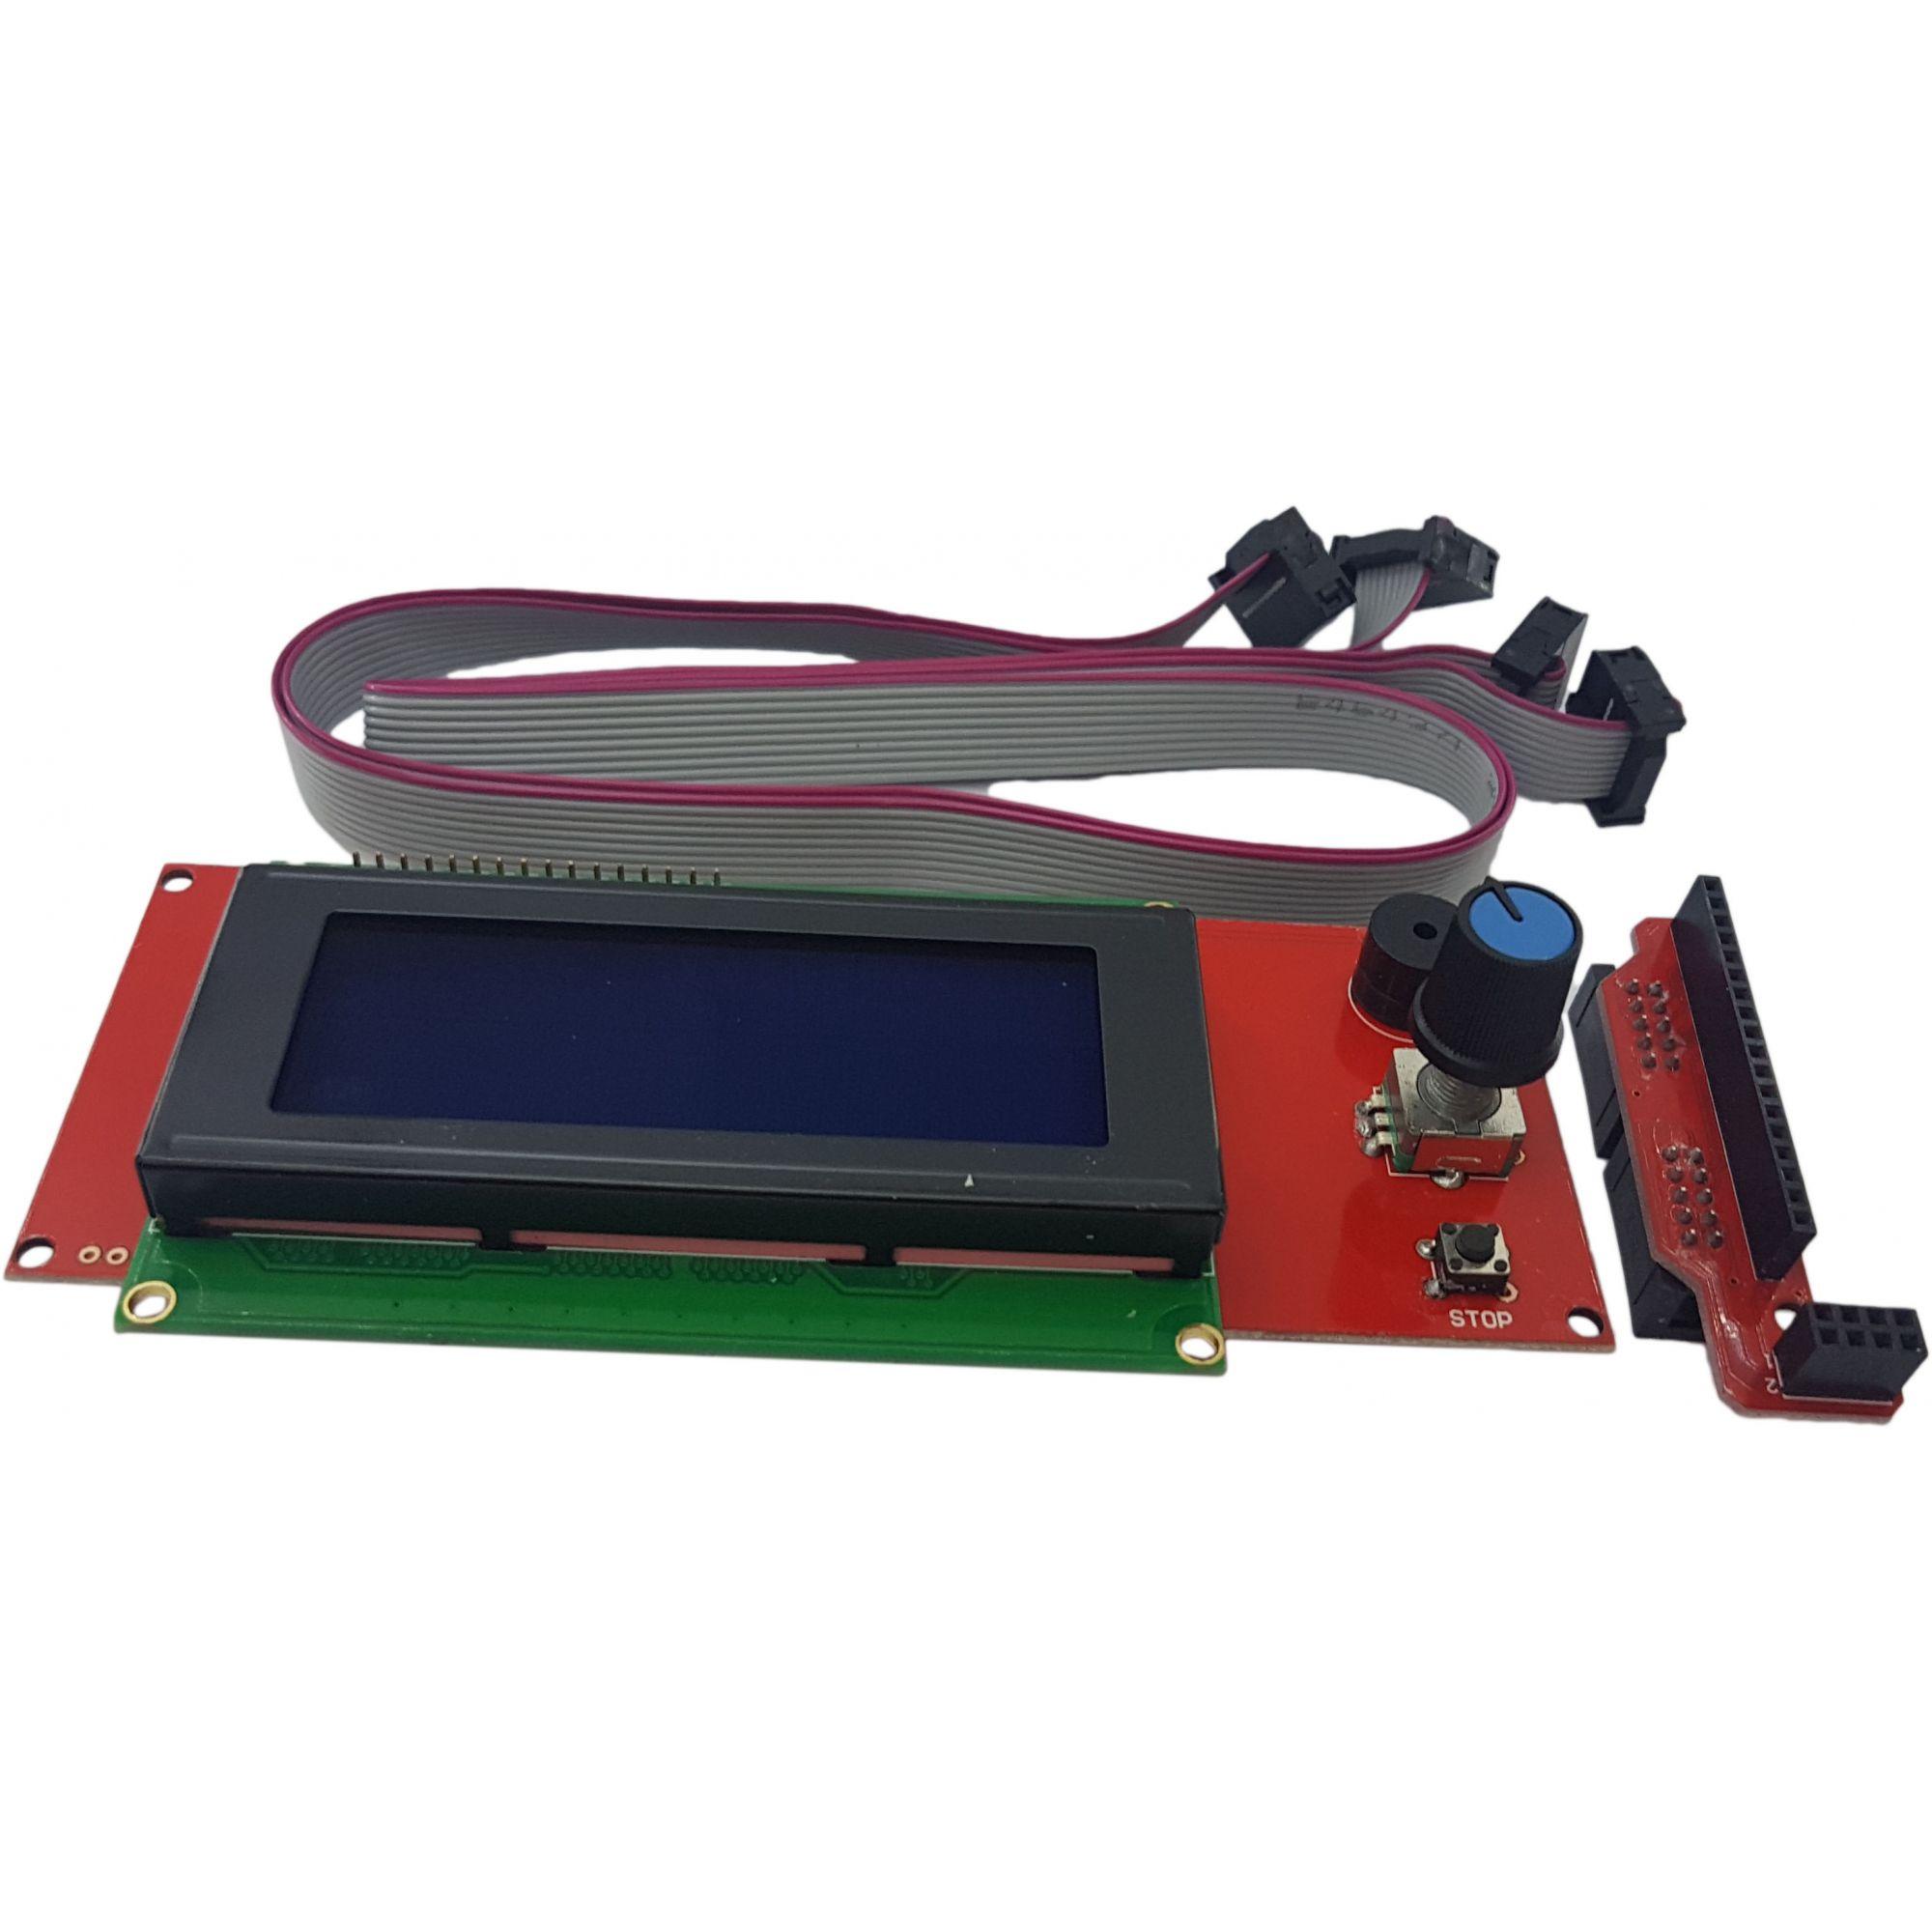 Tela Display 2004 Ramps 20x04 Impressora 3D